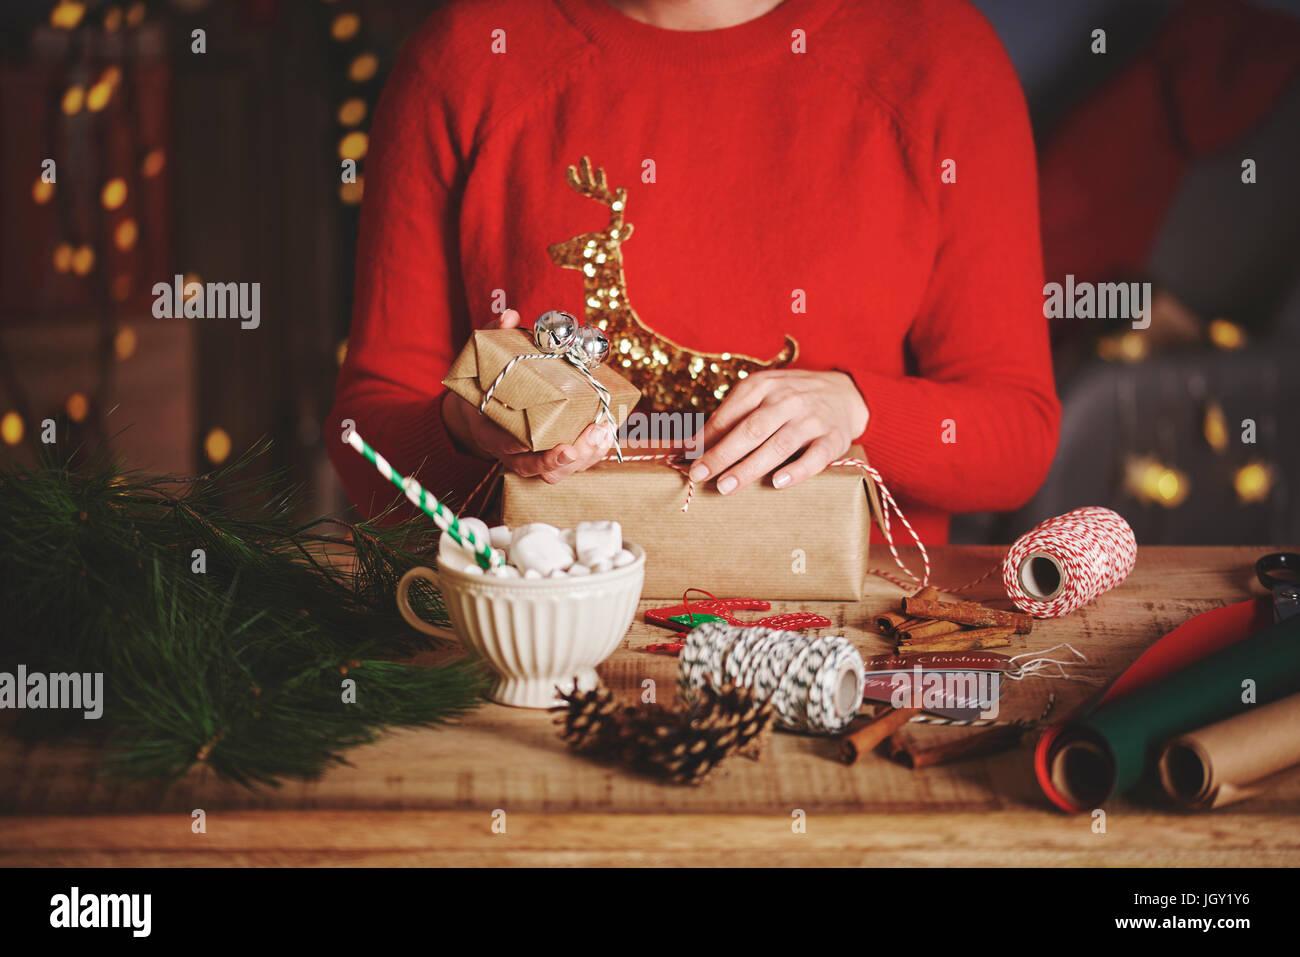 Woman wrapping christmas gifts Stock Photo: 148111690 - Alamy